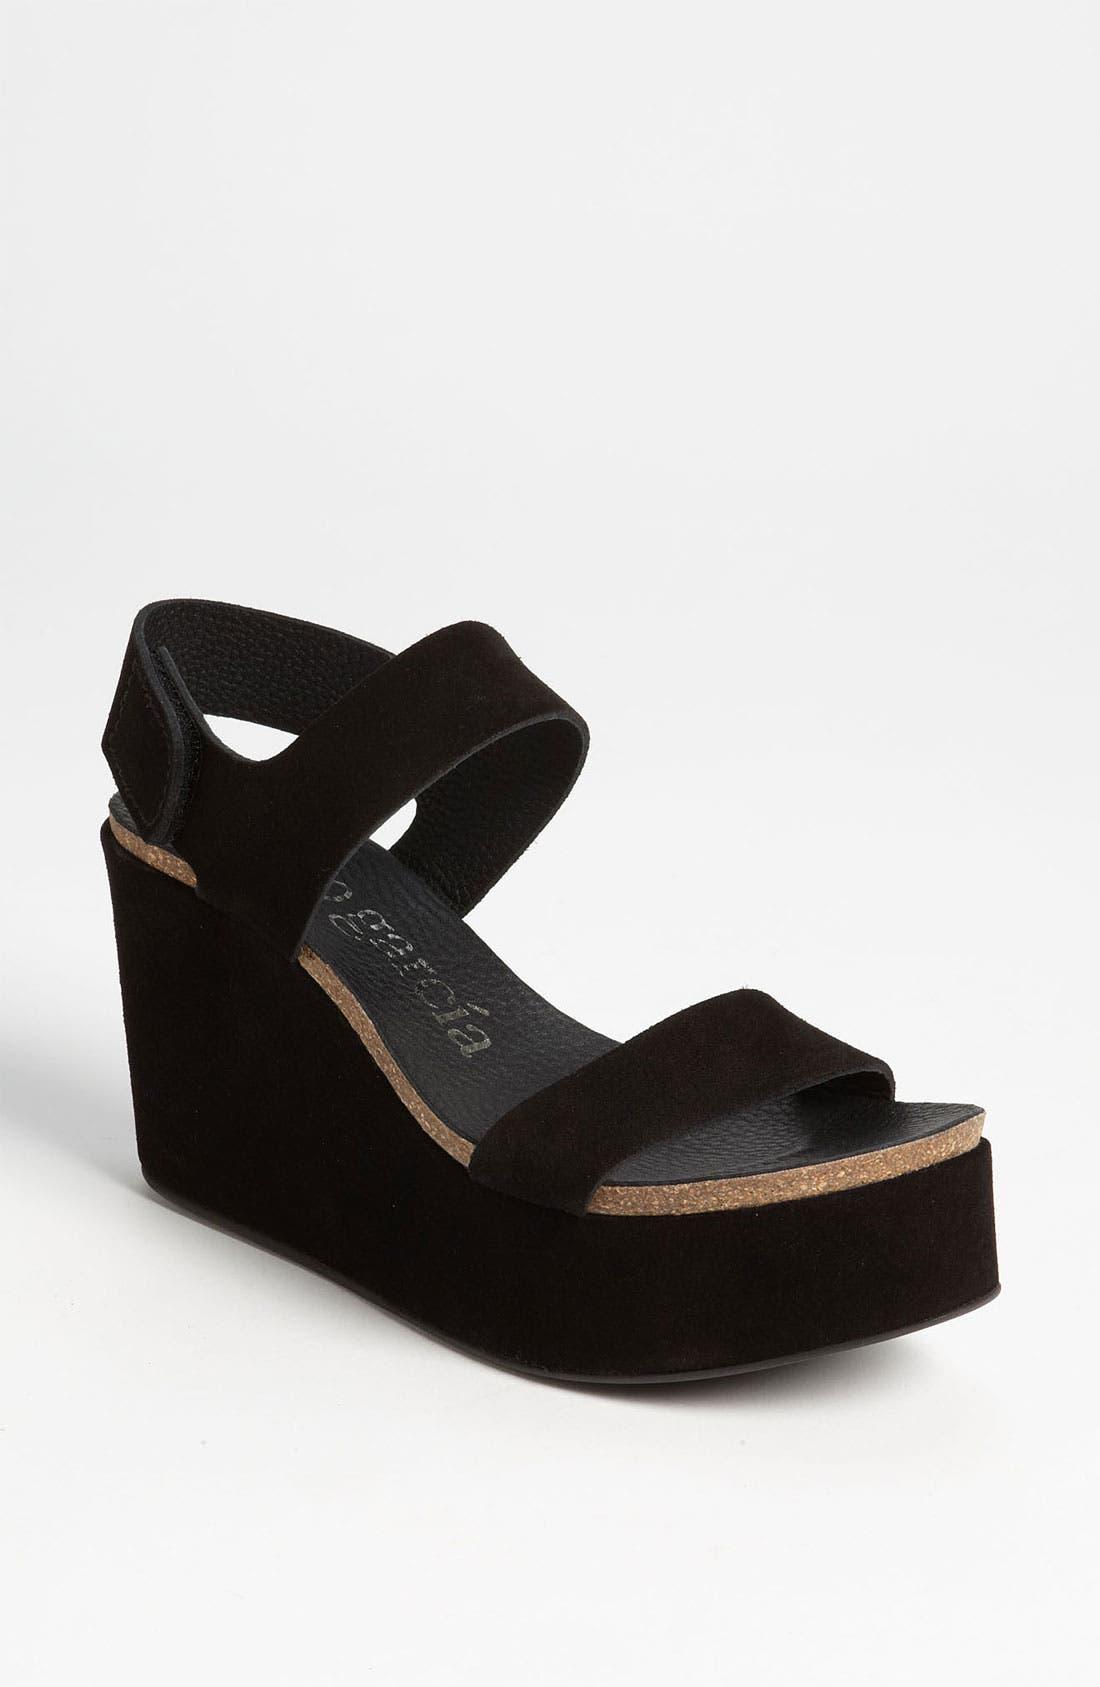 Alternate Image 1 Selected - Pedro Garcia 'Dakota' Wedge Sandal